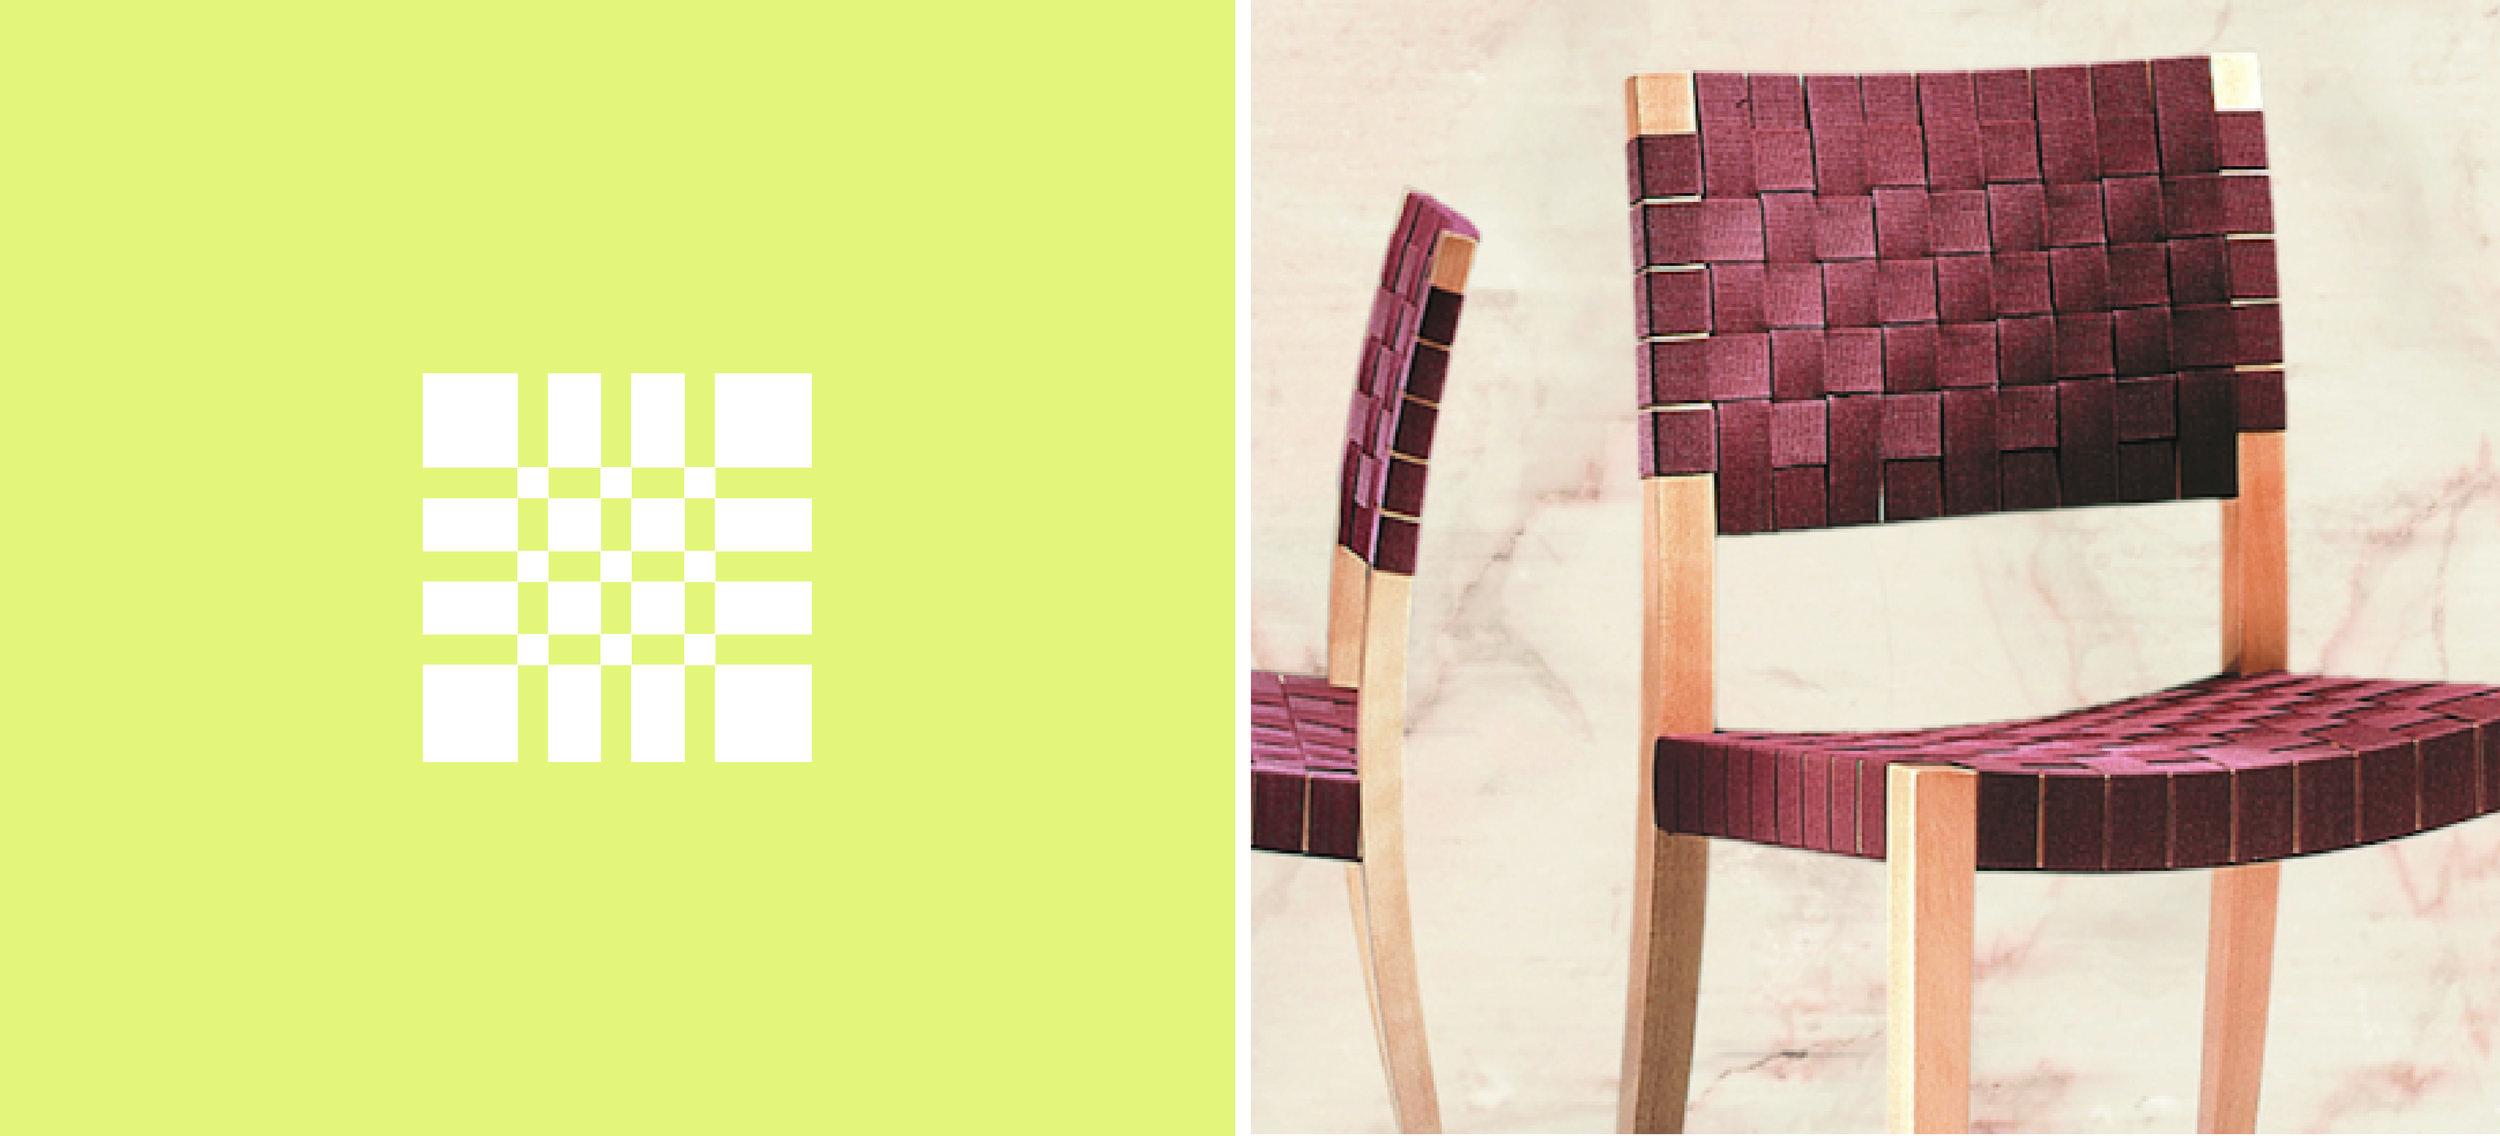 Designlink_SquareSpaceGallery.jpg